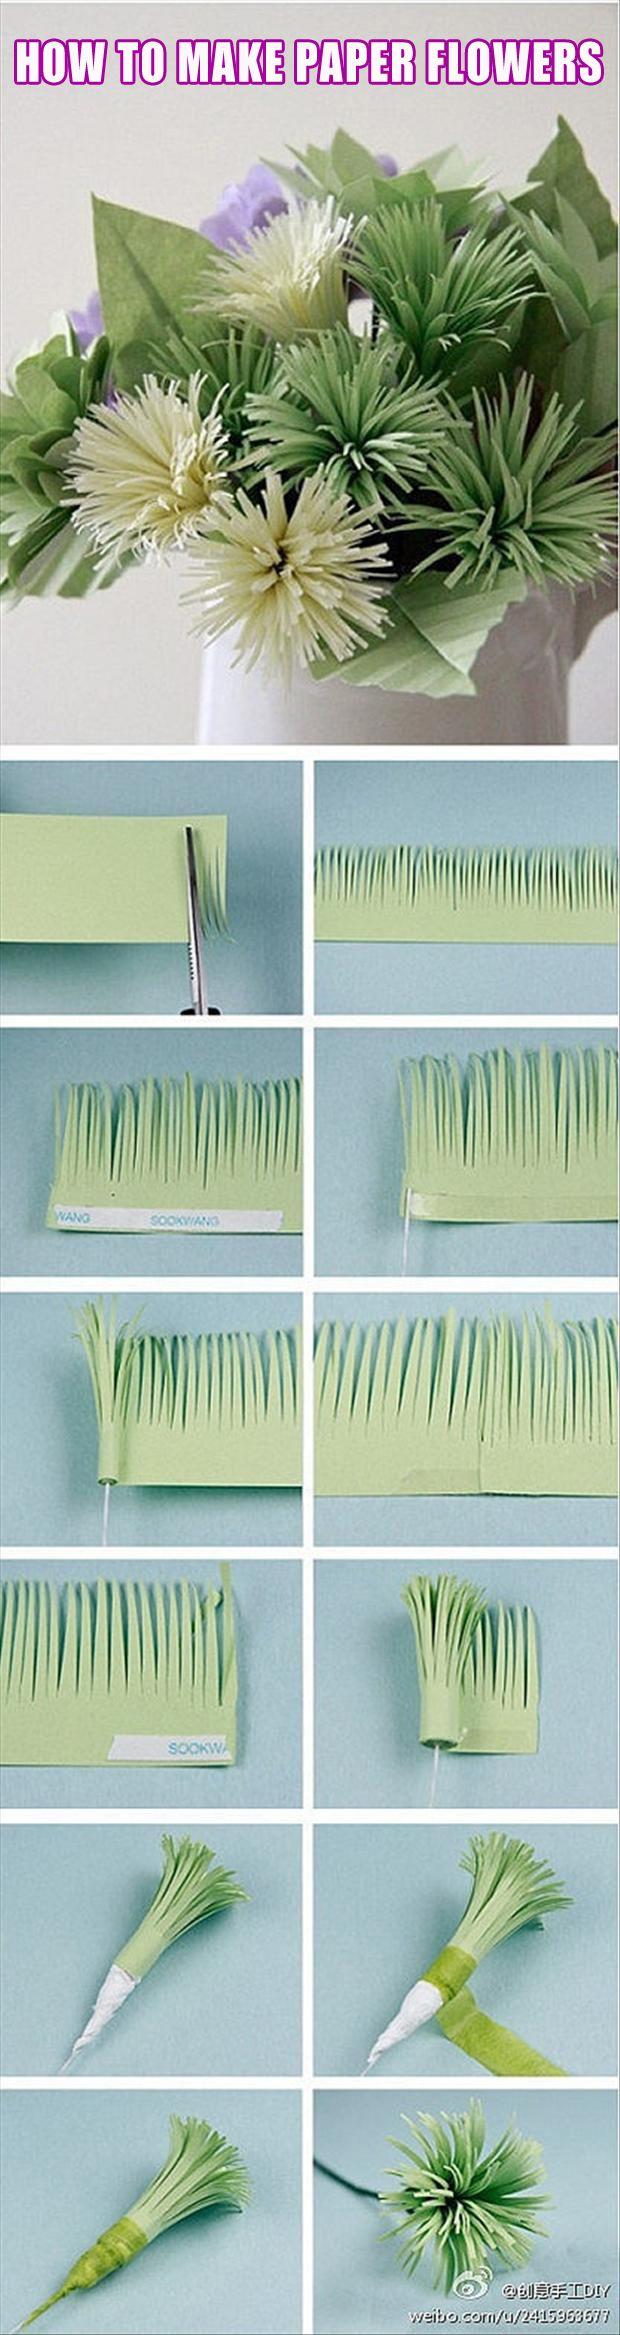 Simple Do It Yourself Craft Ideas   Pics  Pinterest  Craft